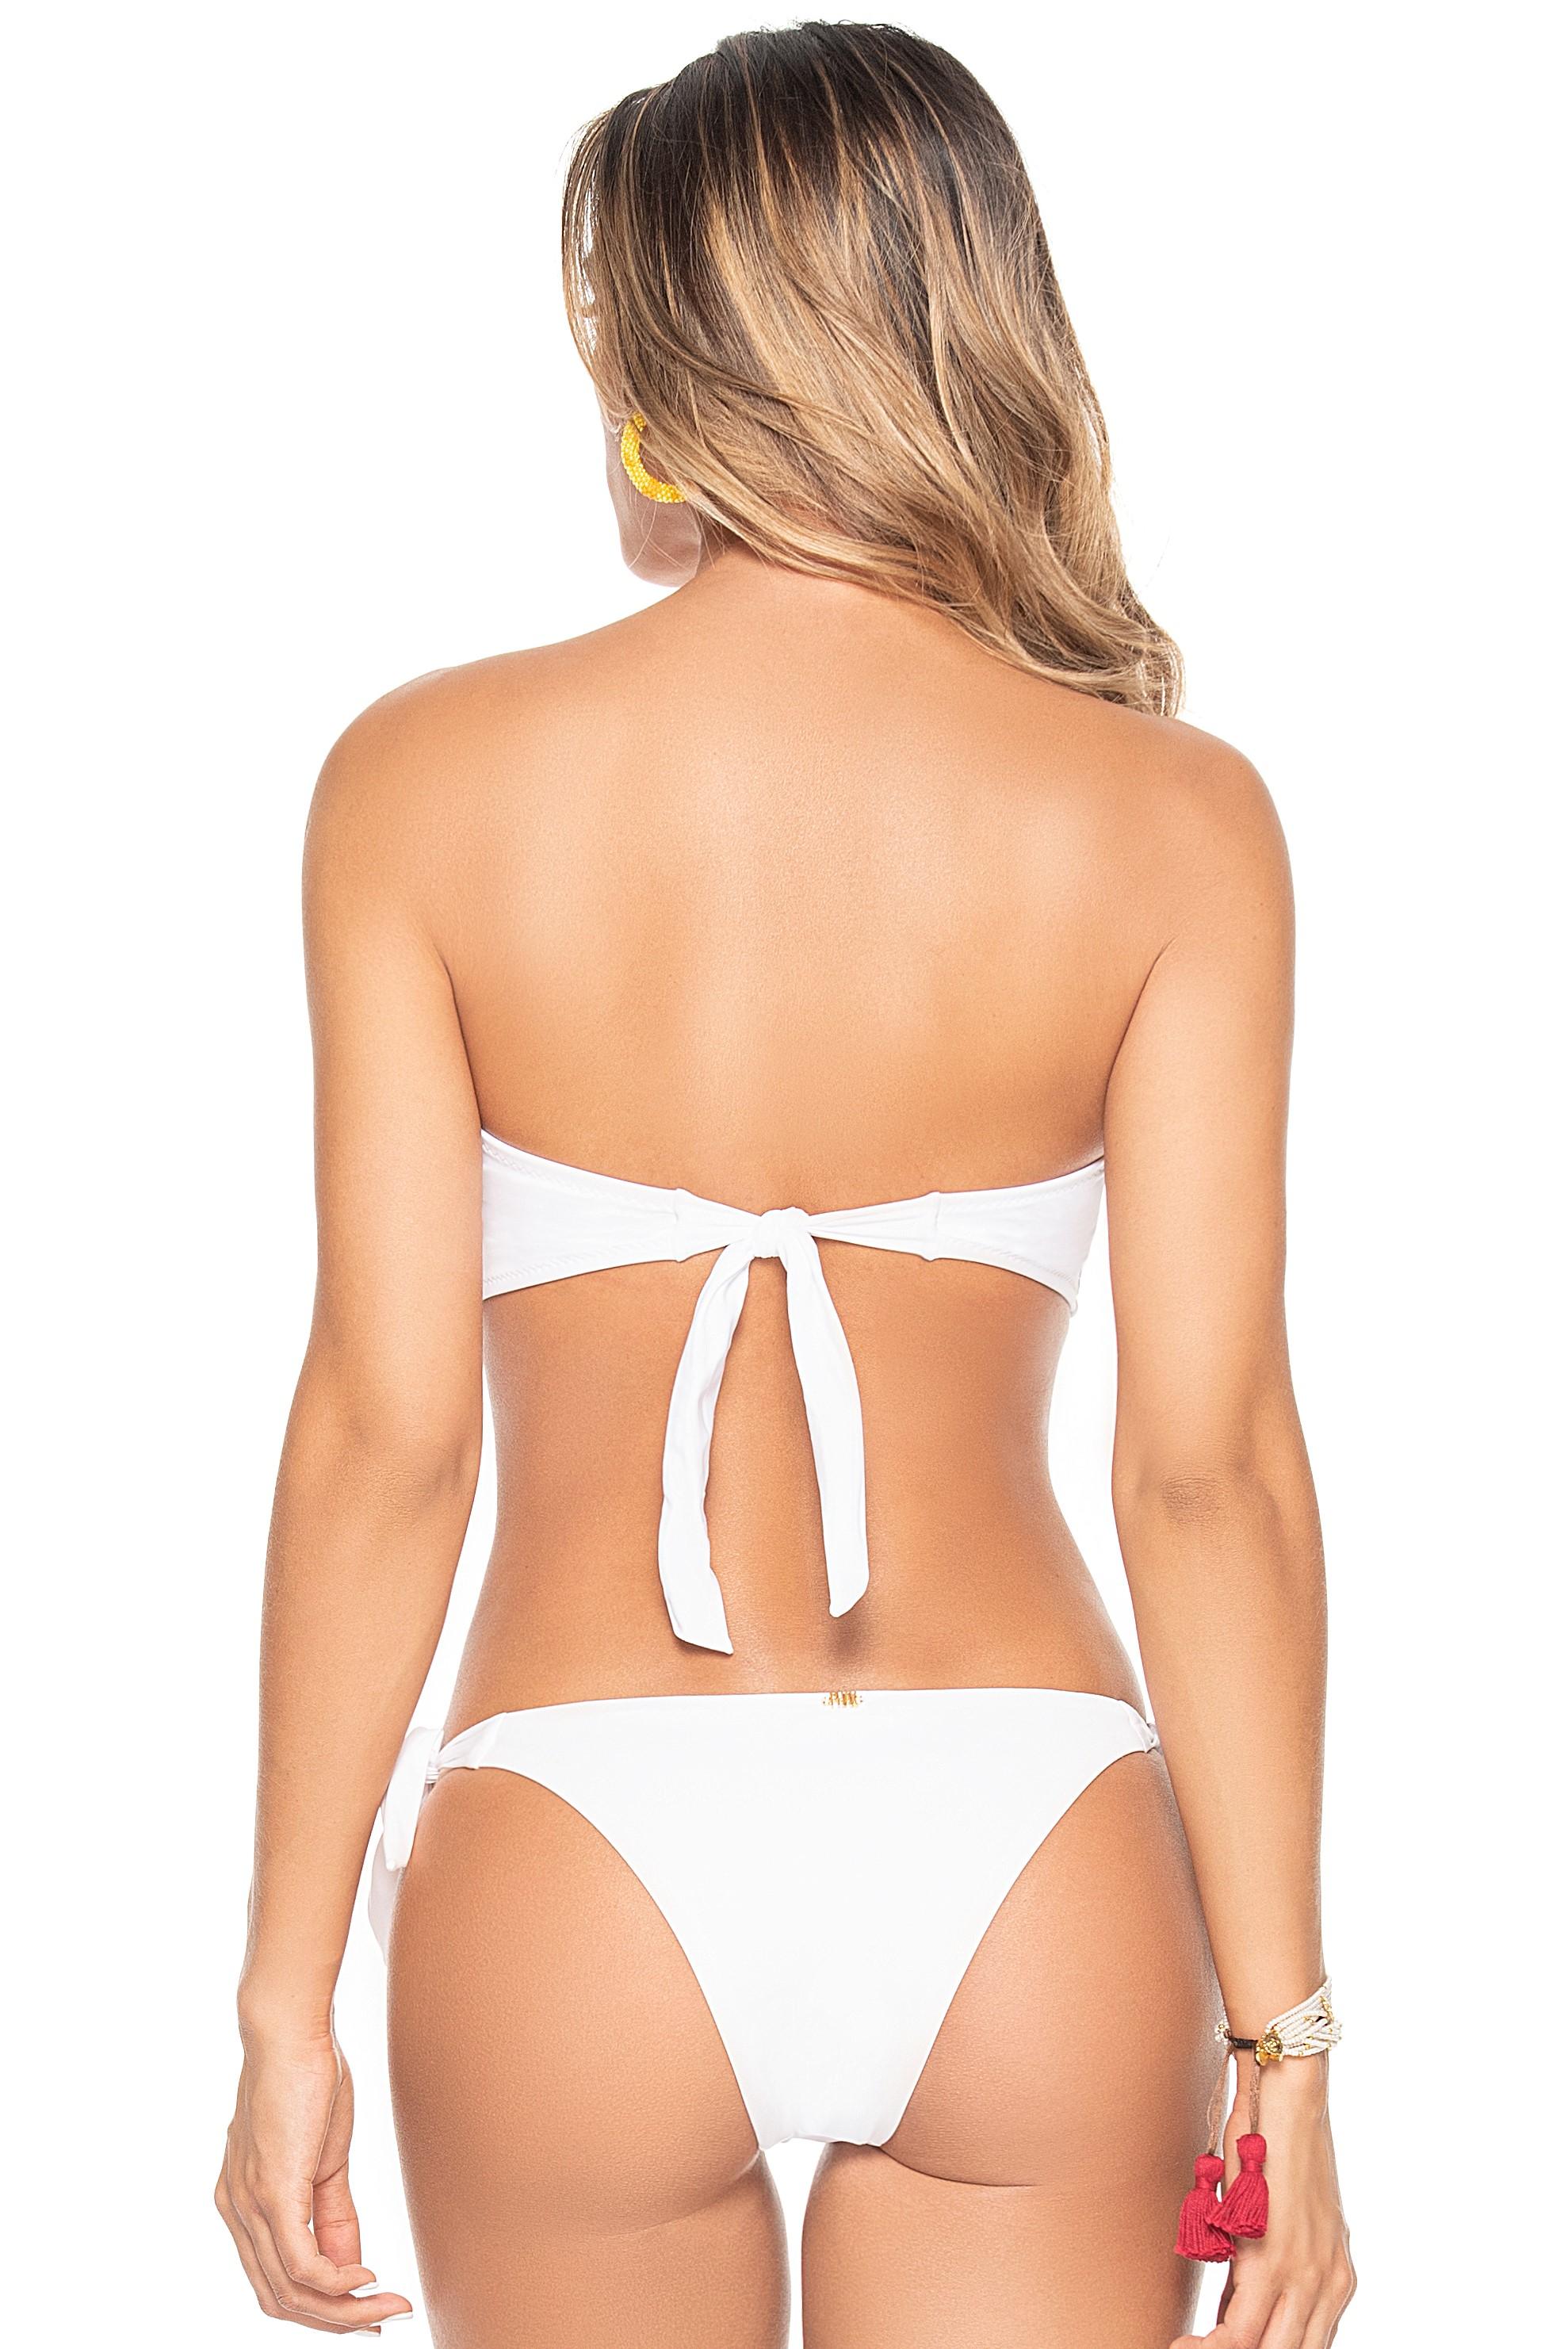 Phax White Triangle Tie Side Bikini Macaron